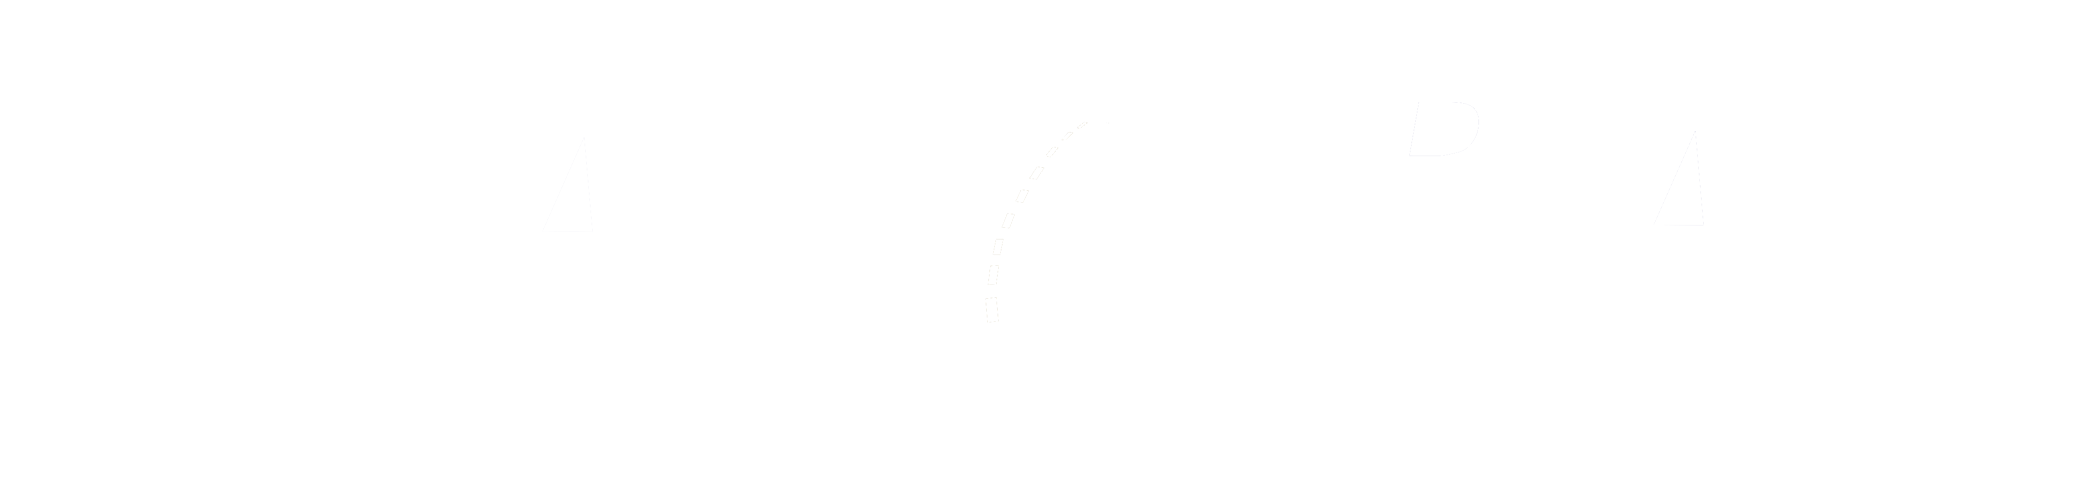 Load Trail LLC Blog